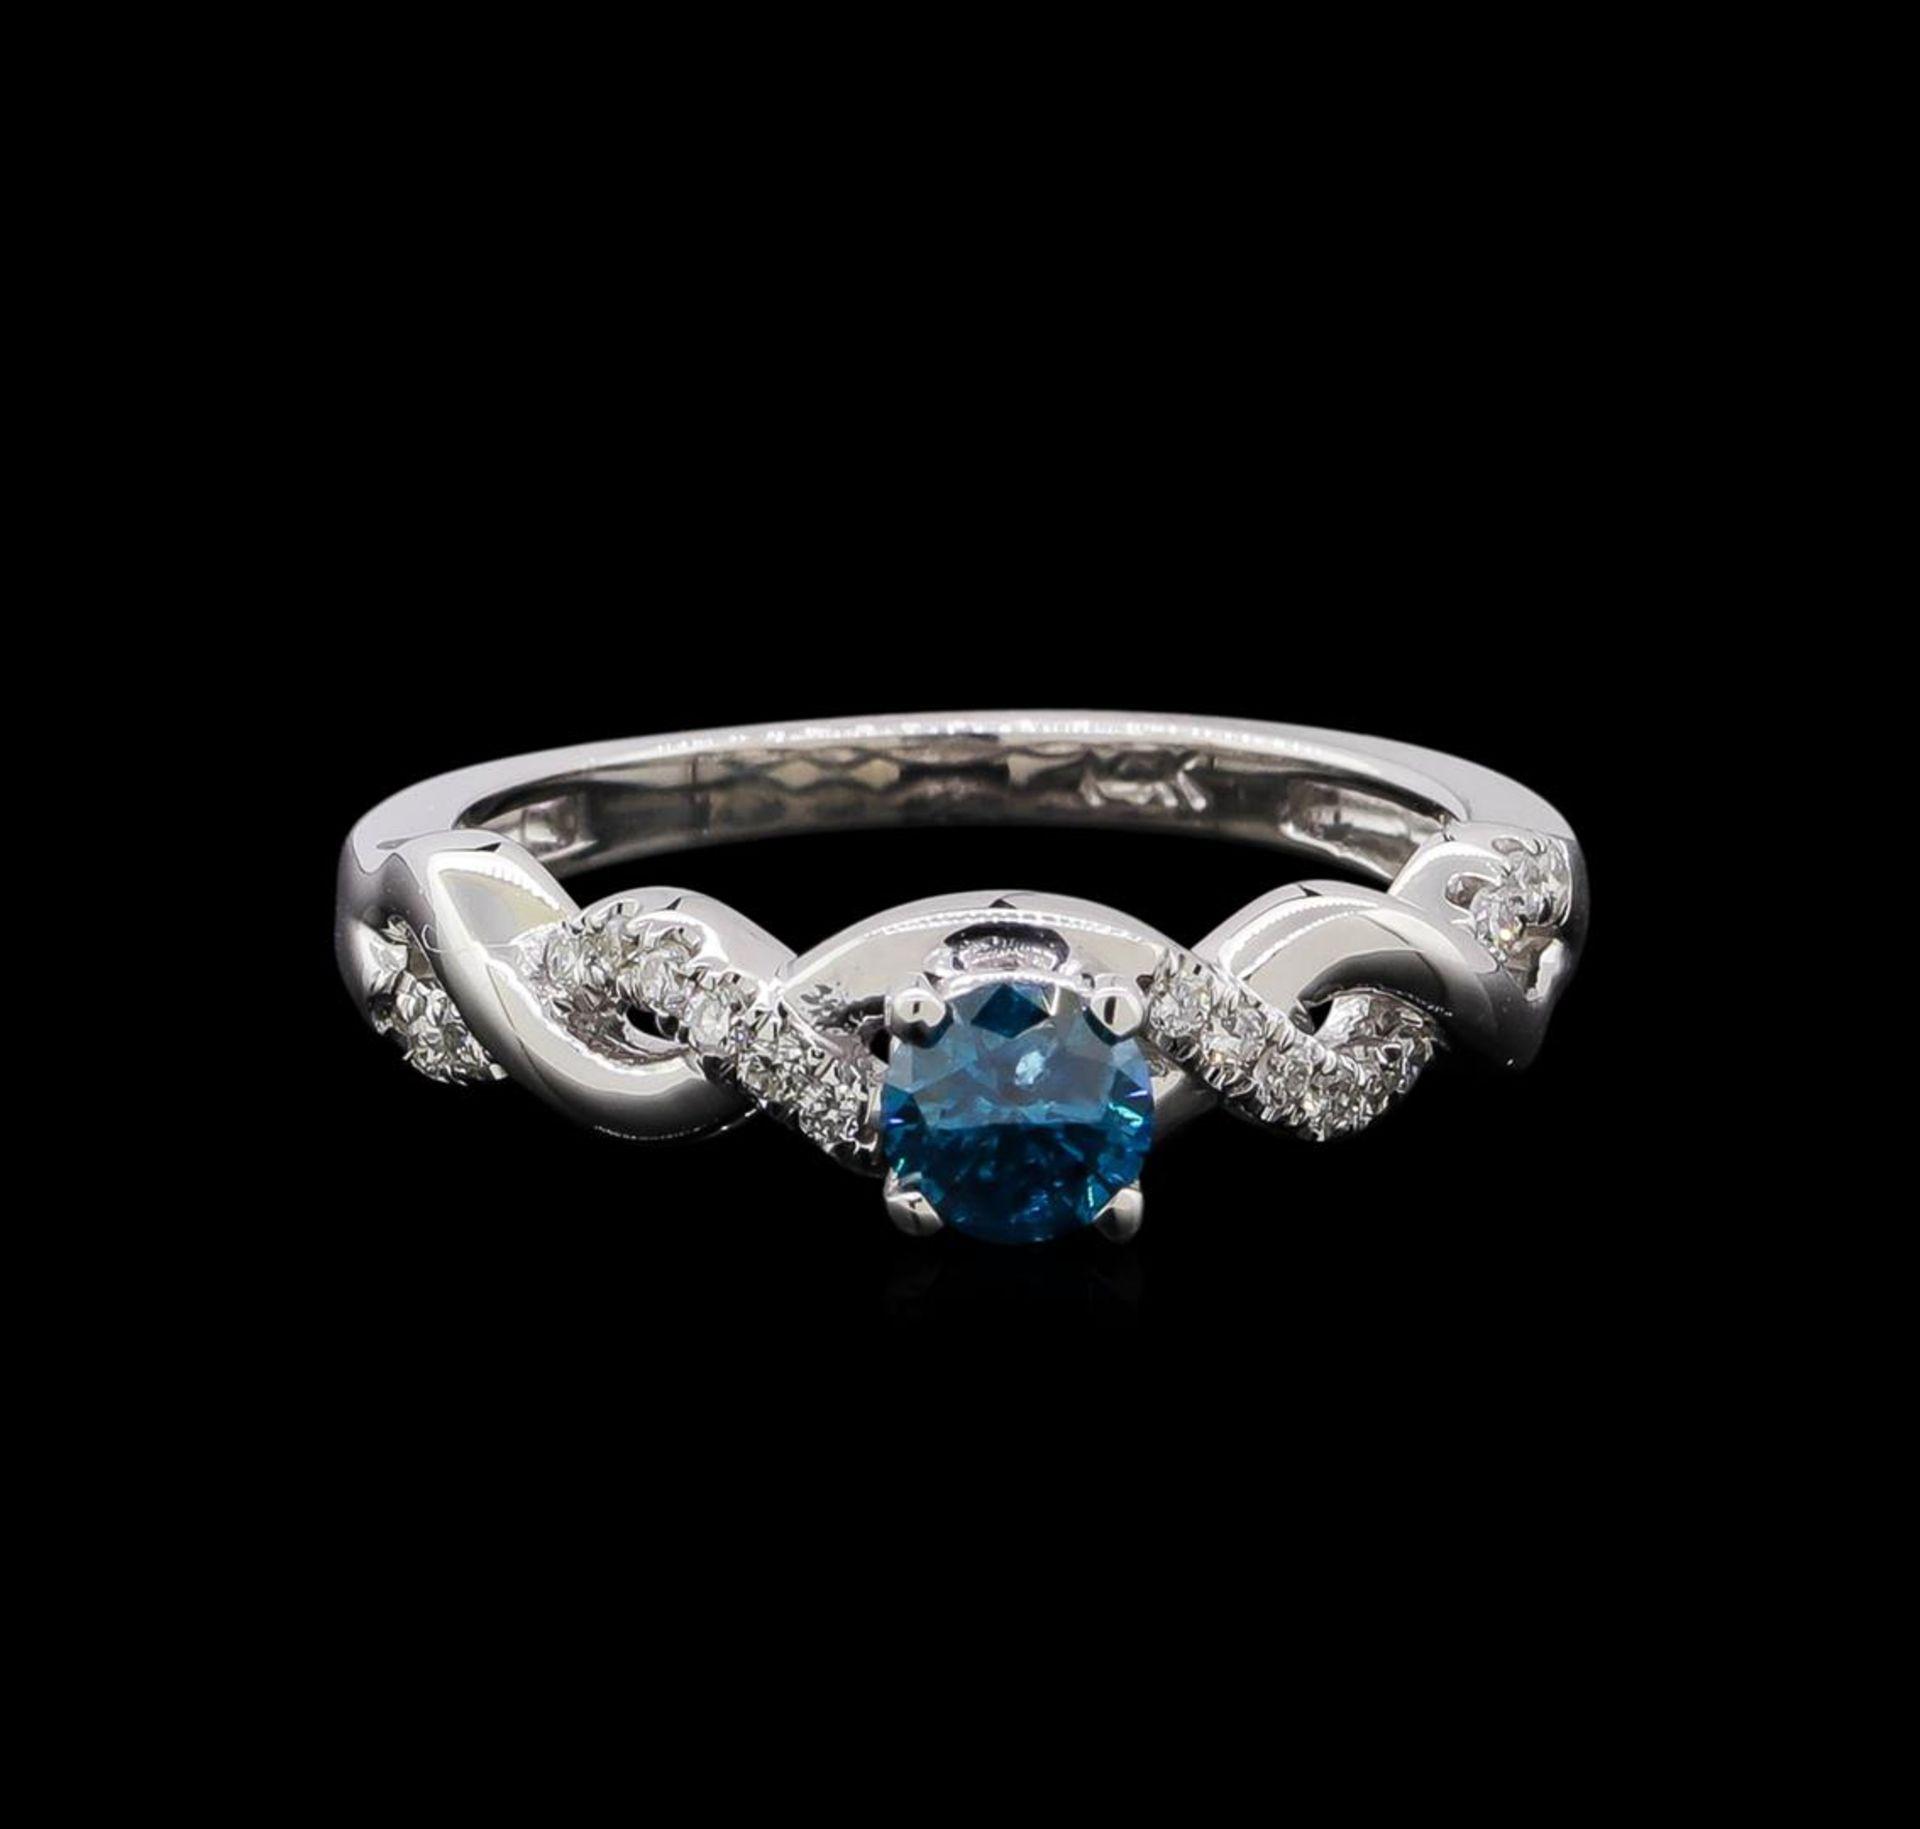 0.49 ctw Blue Diamond Ring - 14KT White Gold - Image 2 of 4